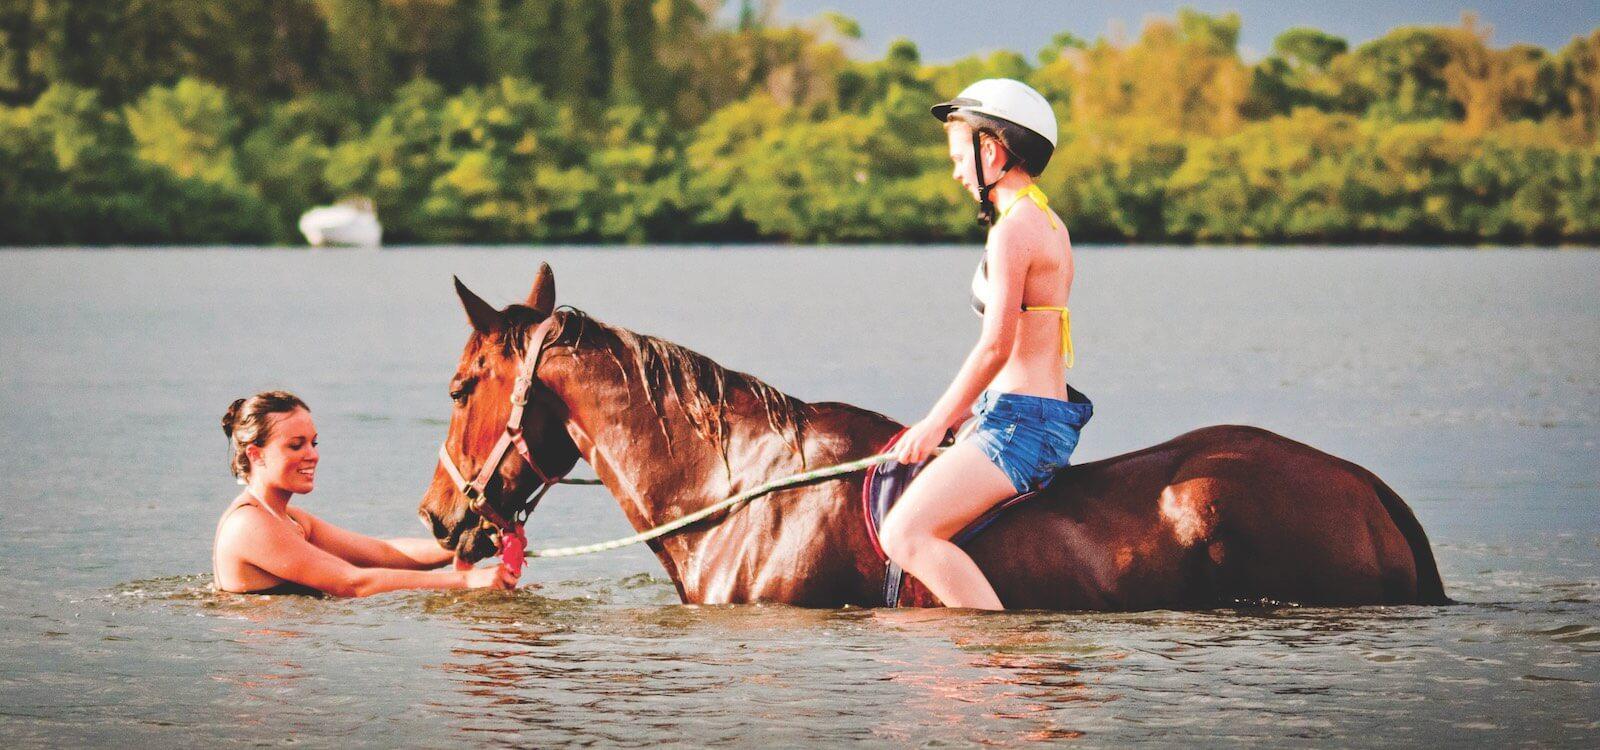 MustDo.com | Swim with horses in Palma Sola Bay, Bradenton, Florida, USA. BeachHorses offers this amazing opportunity!